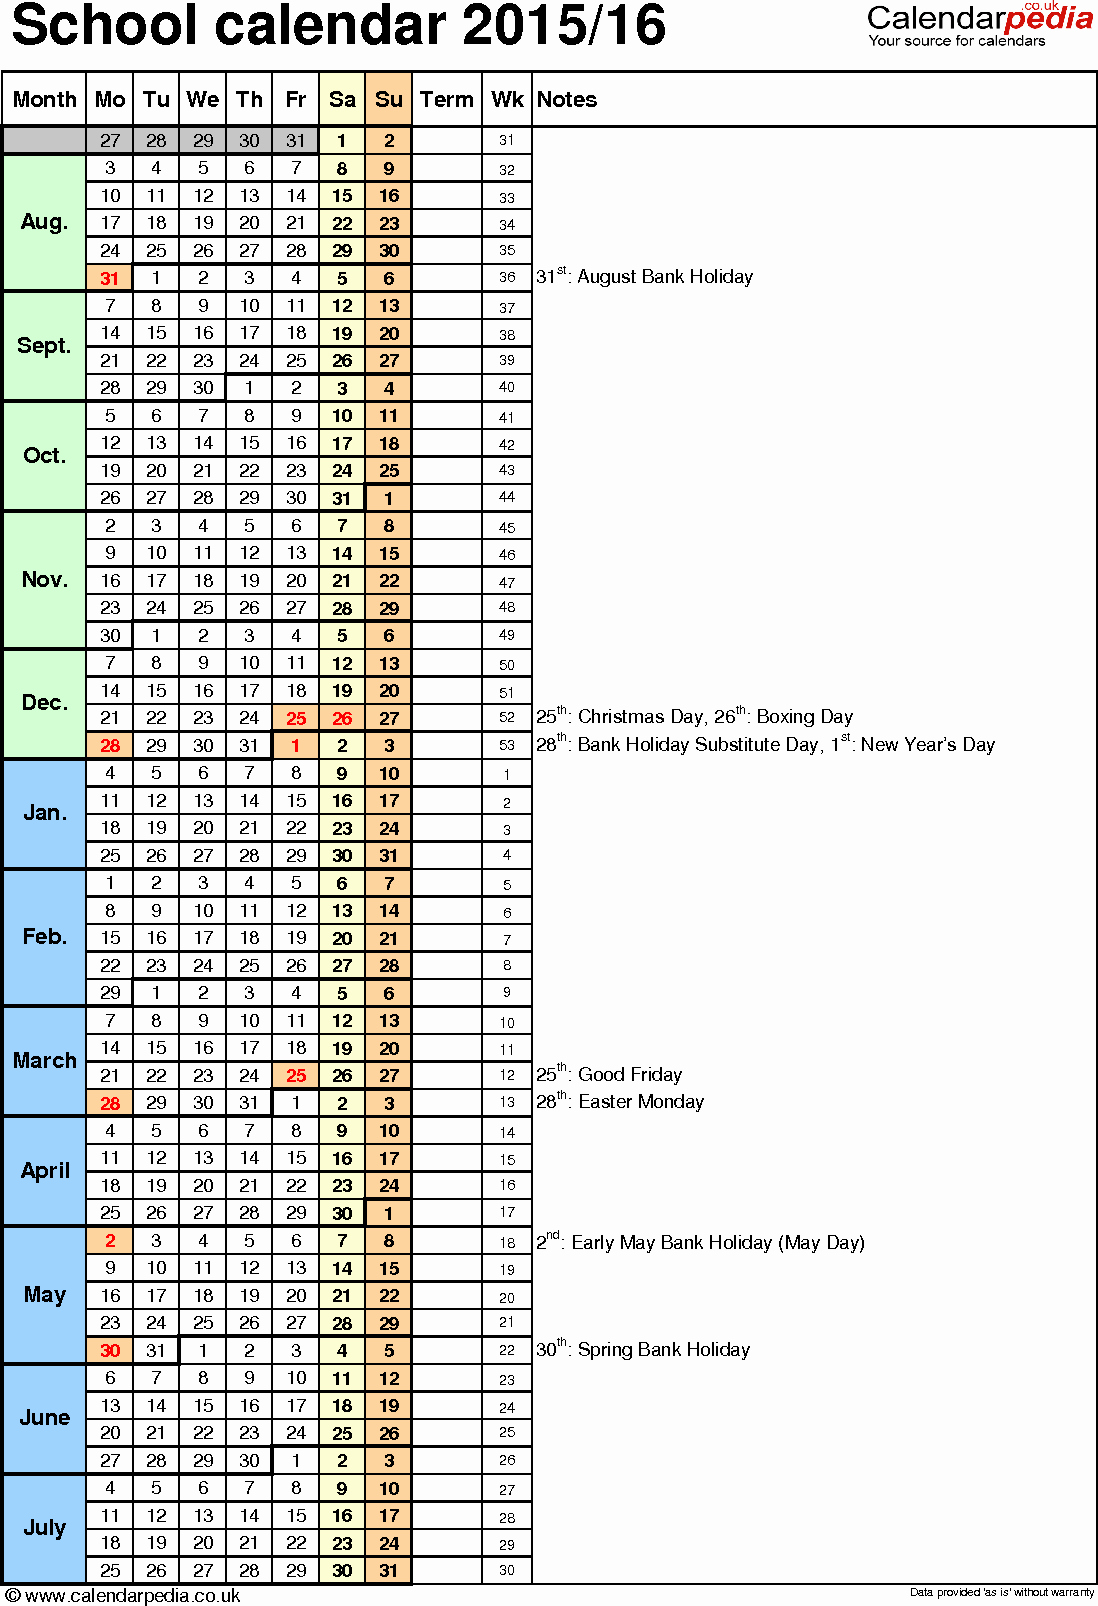 Calendar 2016-17 Template Fresh School Calendars 2015 2016 as Free Printable Word Templates